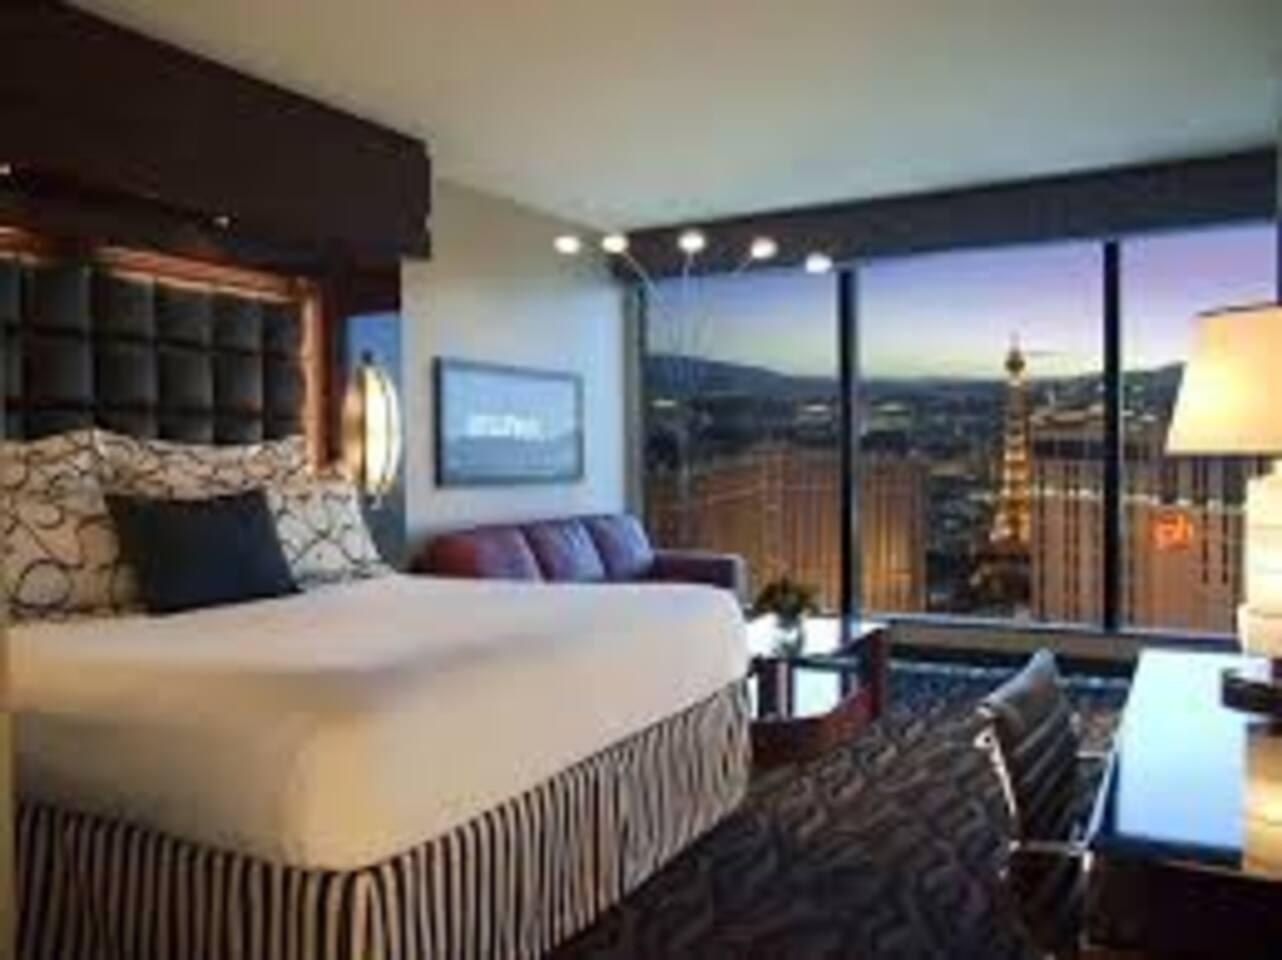 Elara 3 Bedroom Suite - On the strip & near center - Timeshares ...